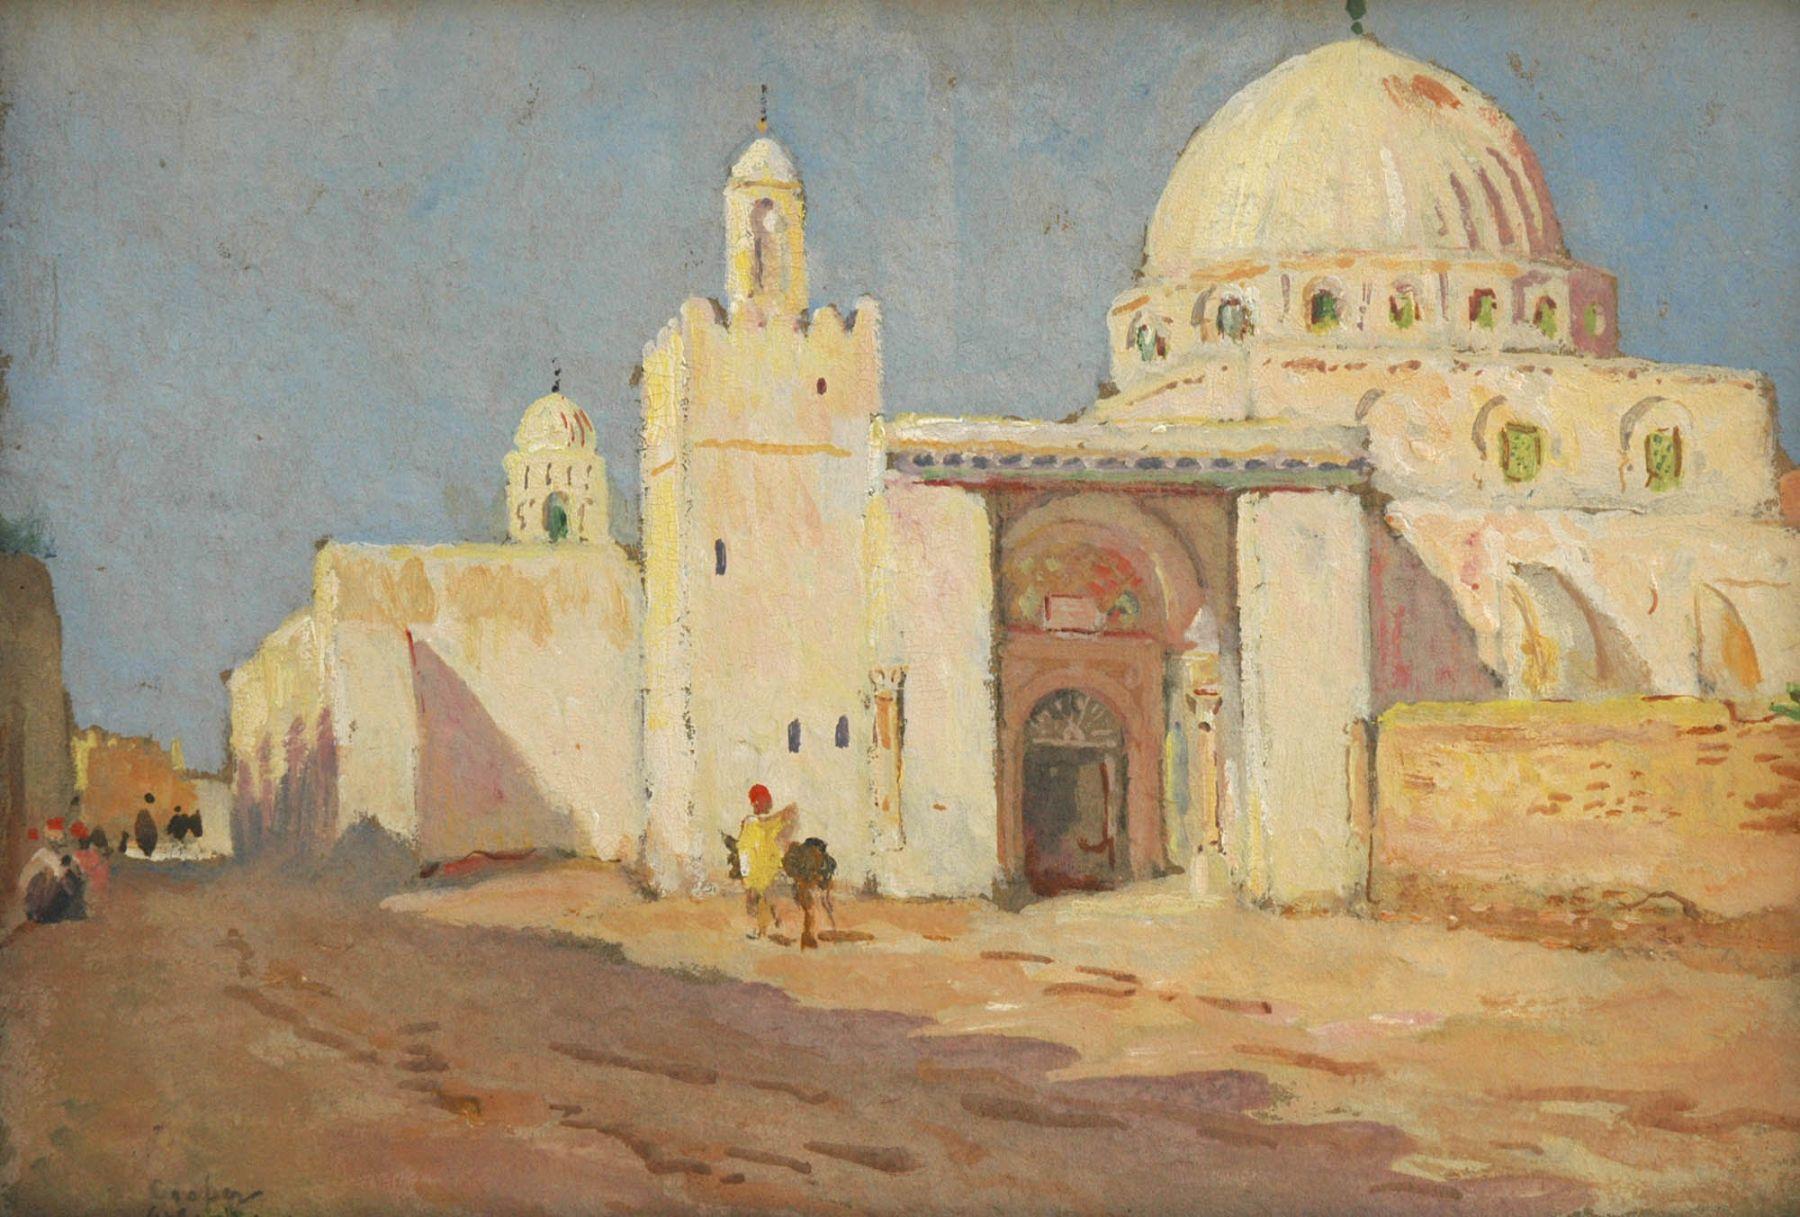 Colin Campbell Cooper, Mosque Sioli Ocbdebkasar, 1929